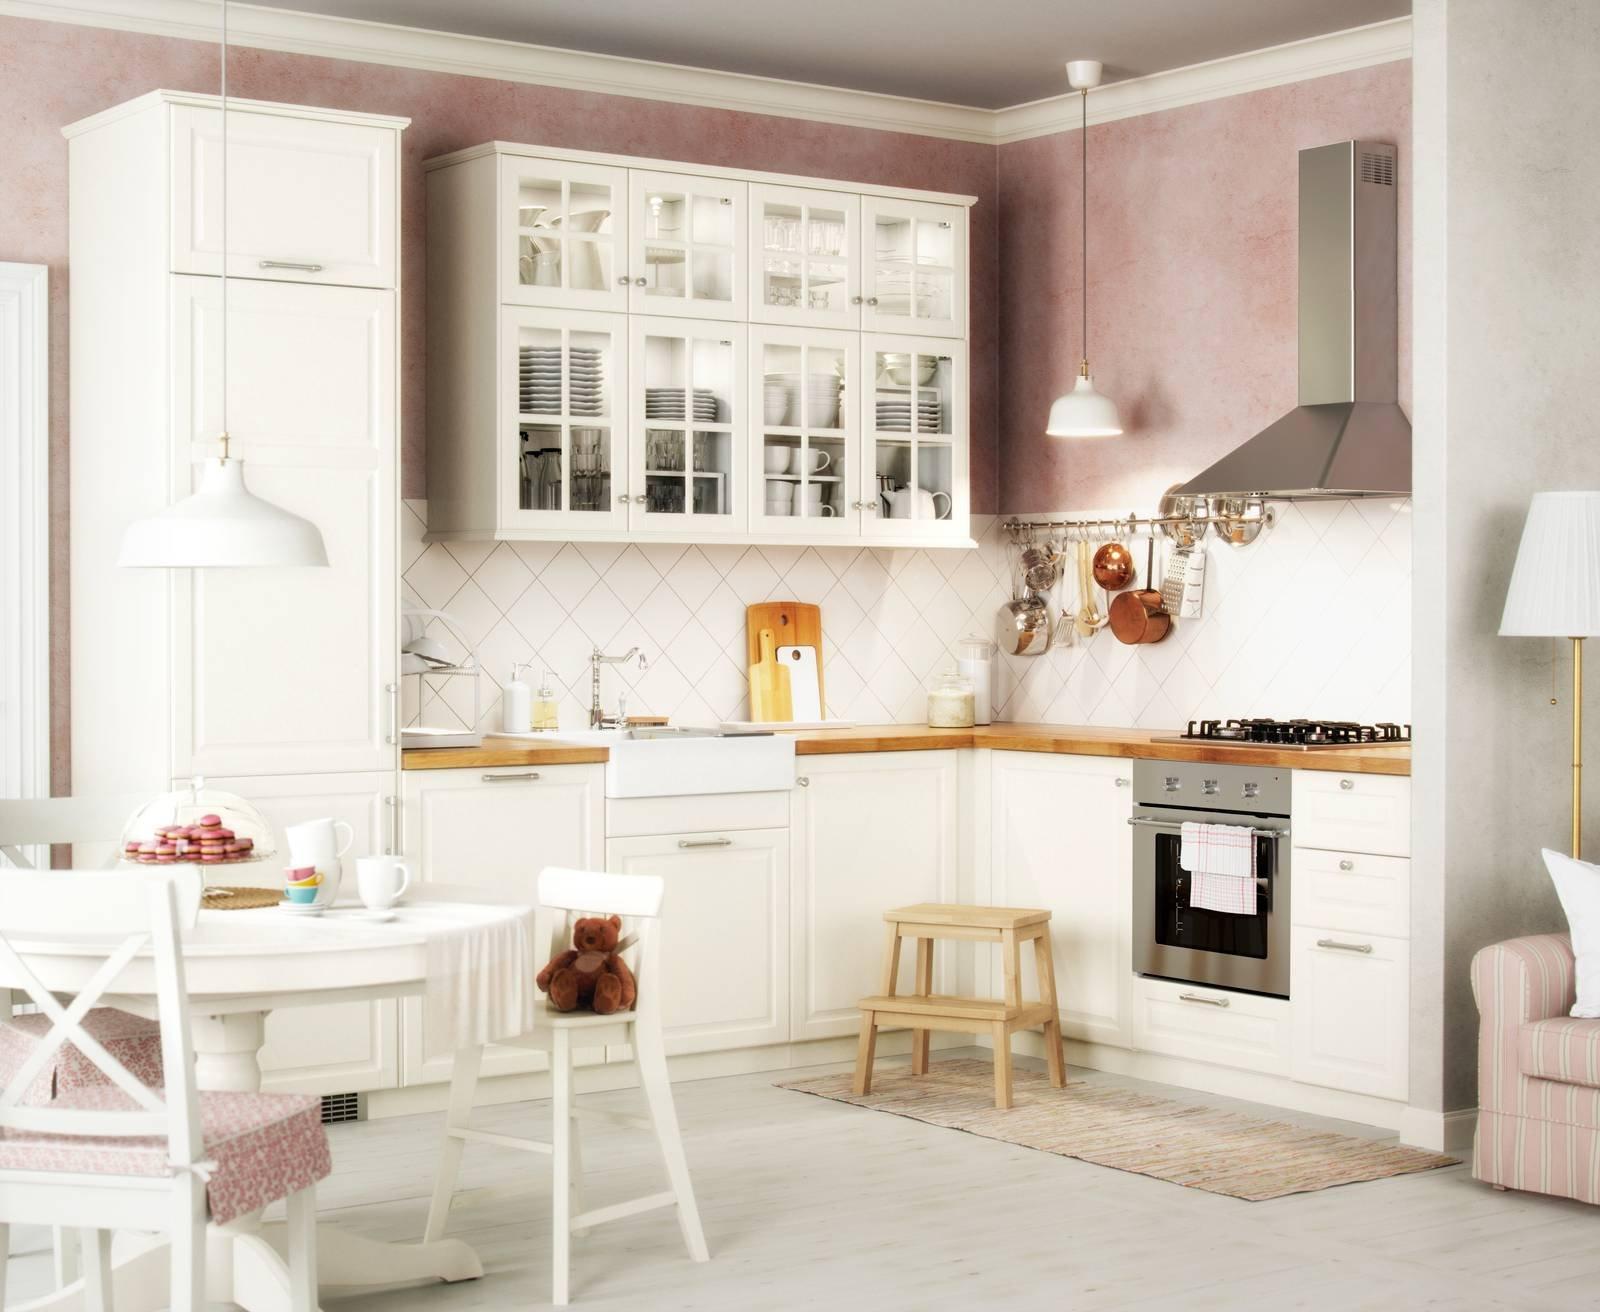 Top Cucina Ikea Opinioni. Gallery Of Cat Cucina Tags Cucina ...